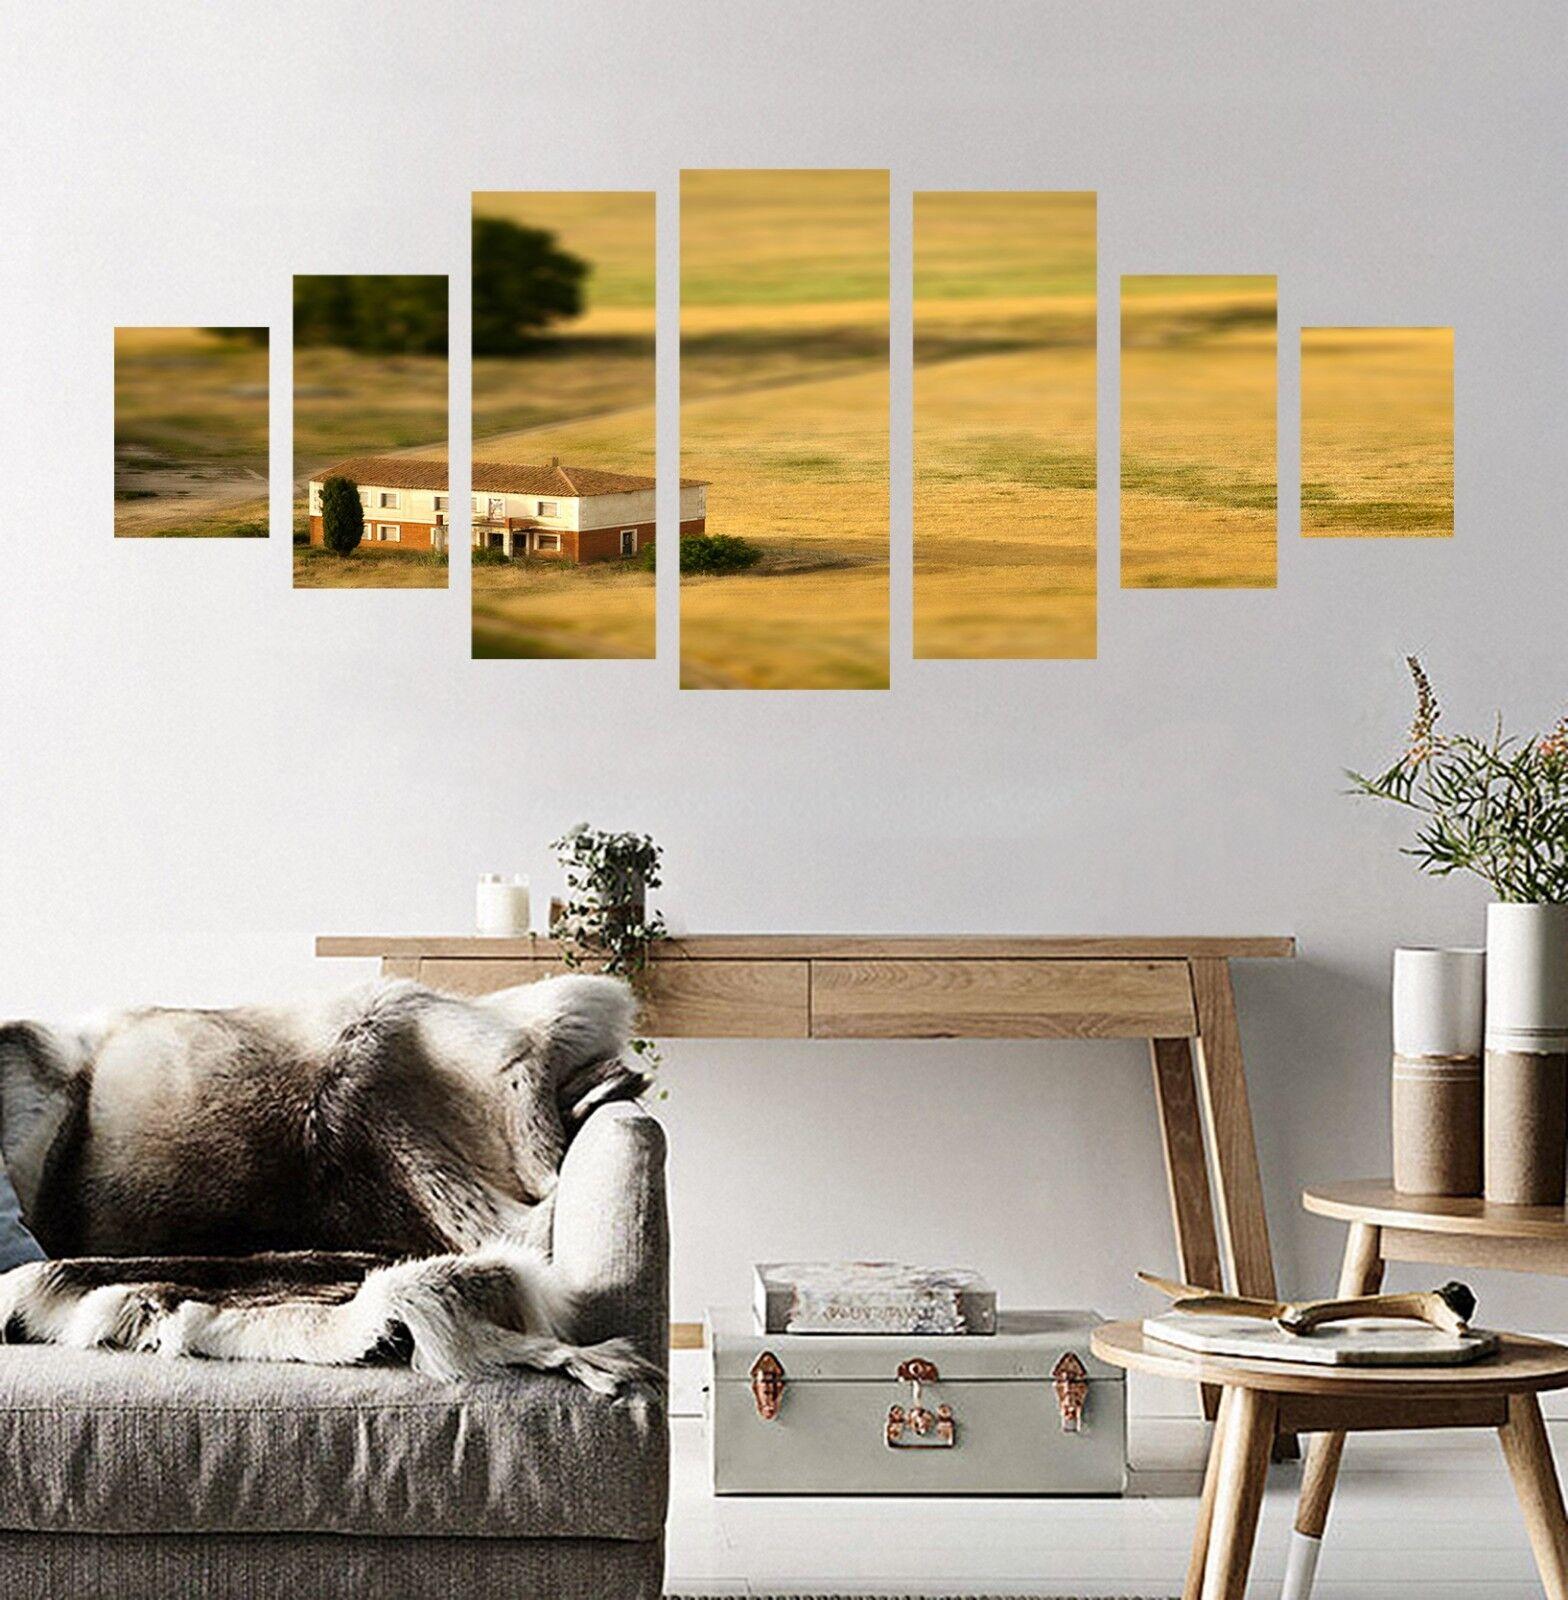 3D Grassland 813 Unframed Print Wall Paper Decal Wall Deco Indoor AJ Wall Jenny